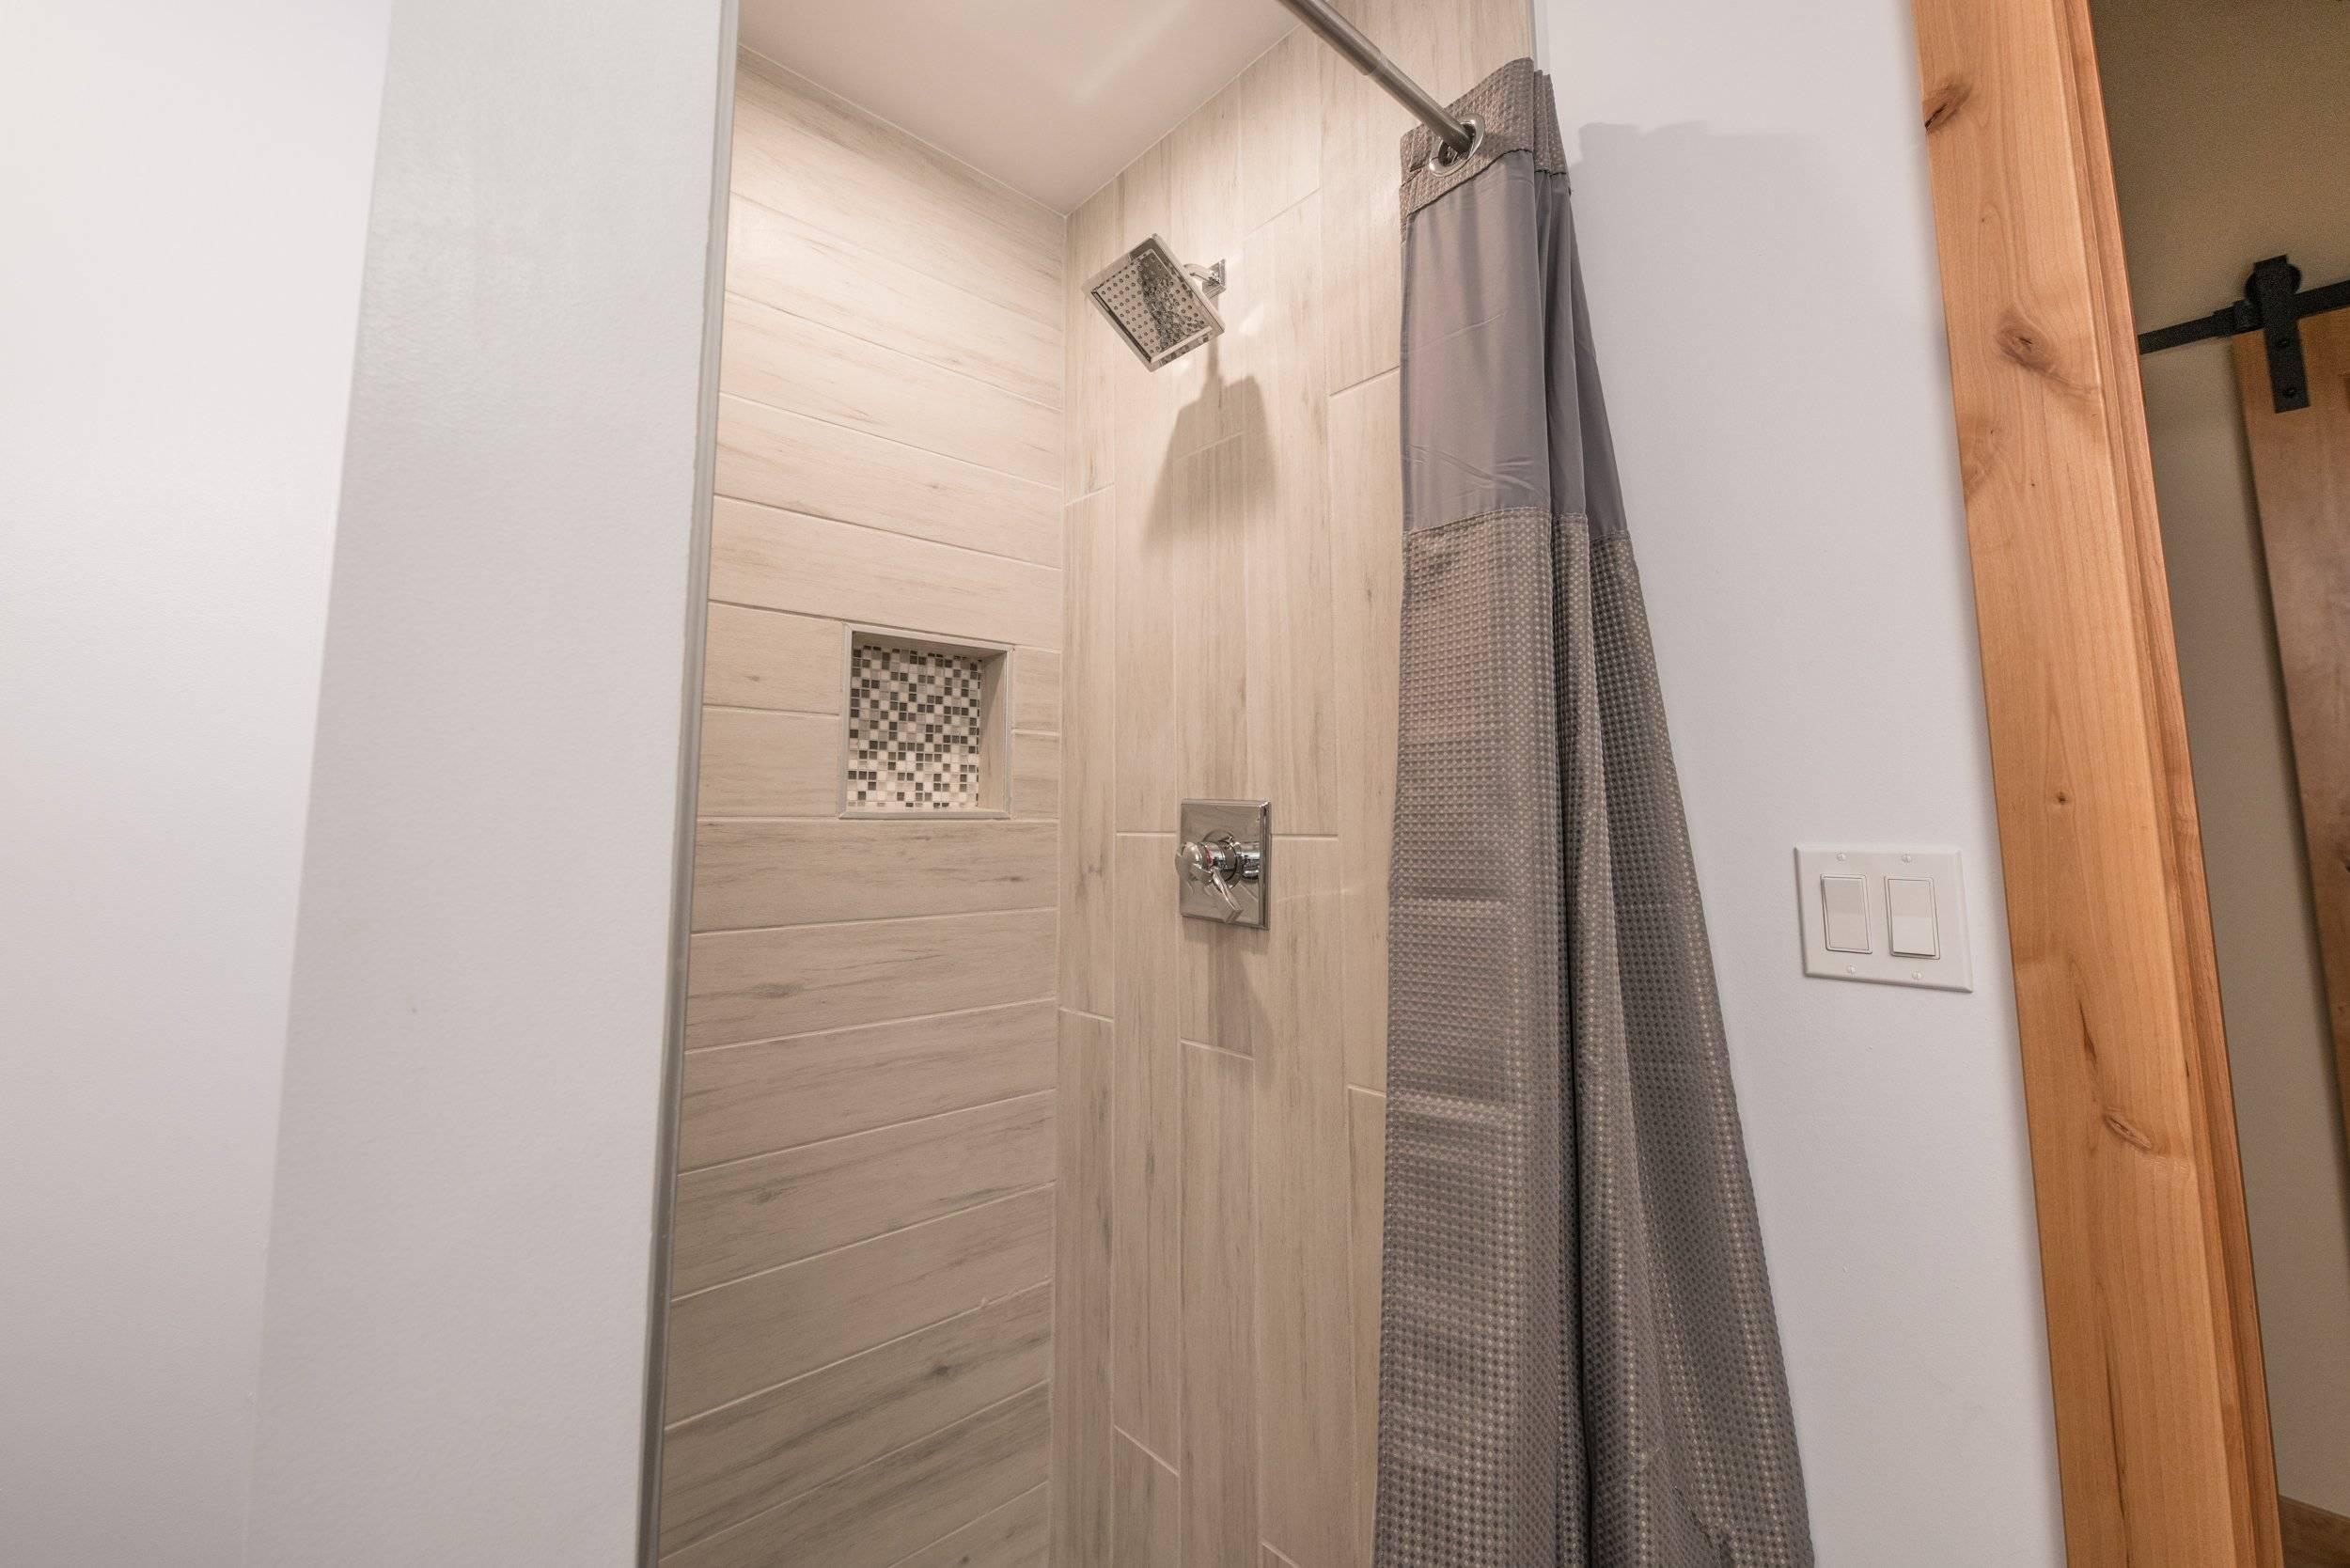 Upstairs bathroom shower (2nd floor of loft)